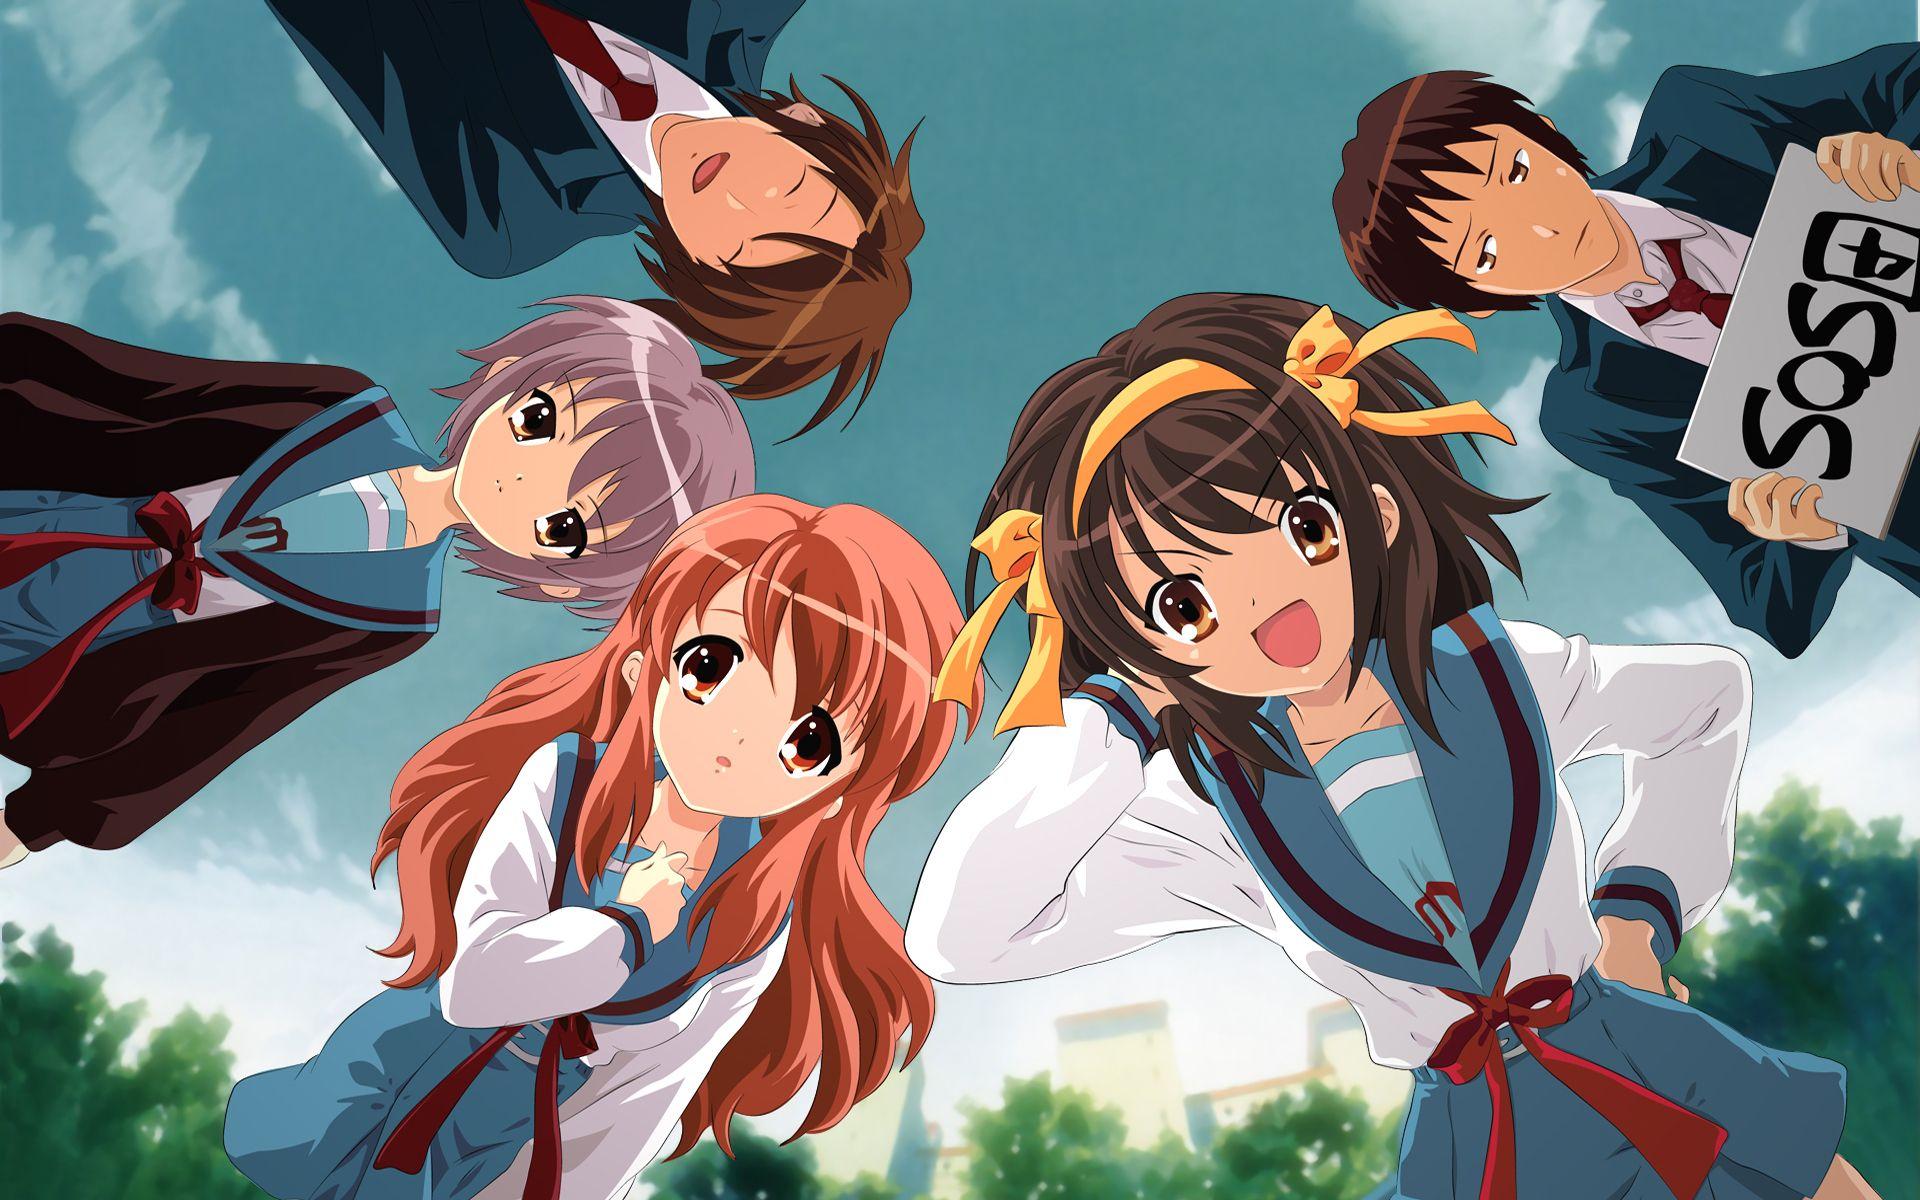 The Melancholy Of Haruhi Suzumiya Review Anime Characters Anime